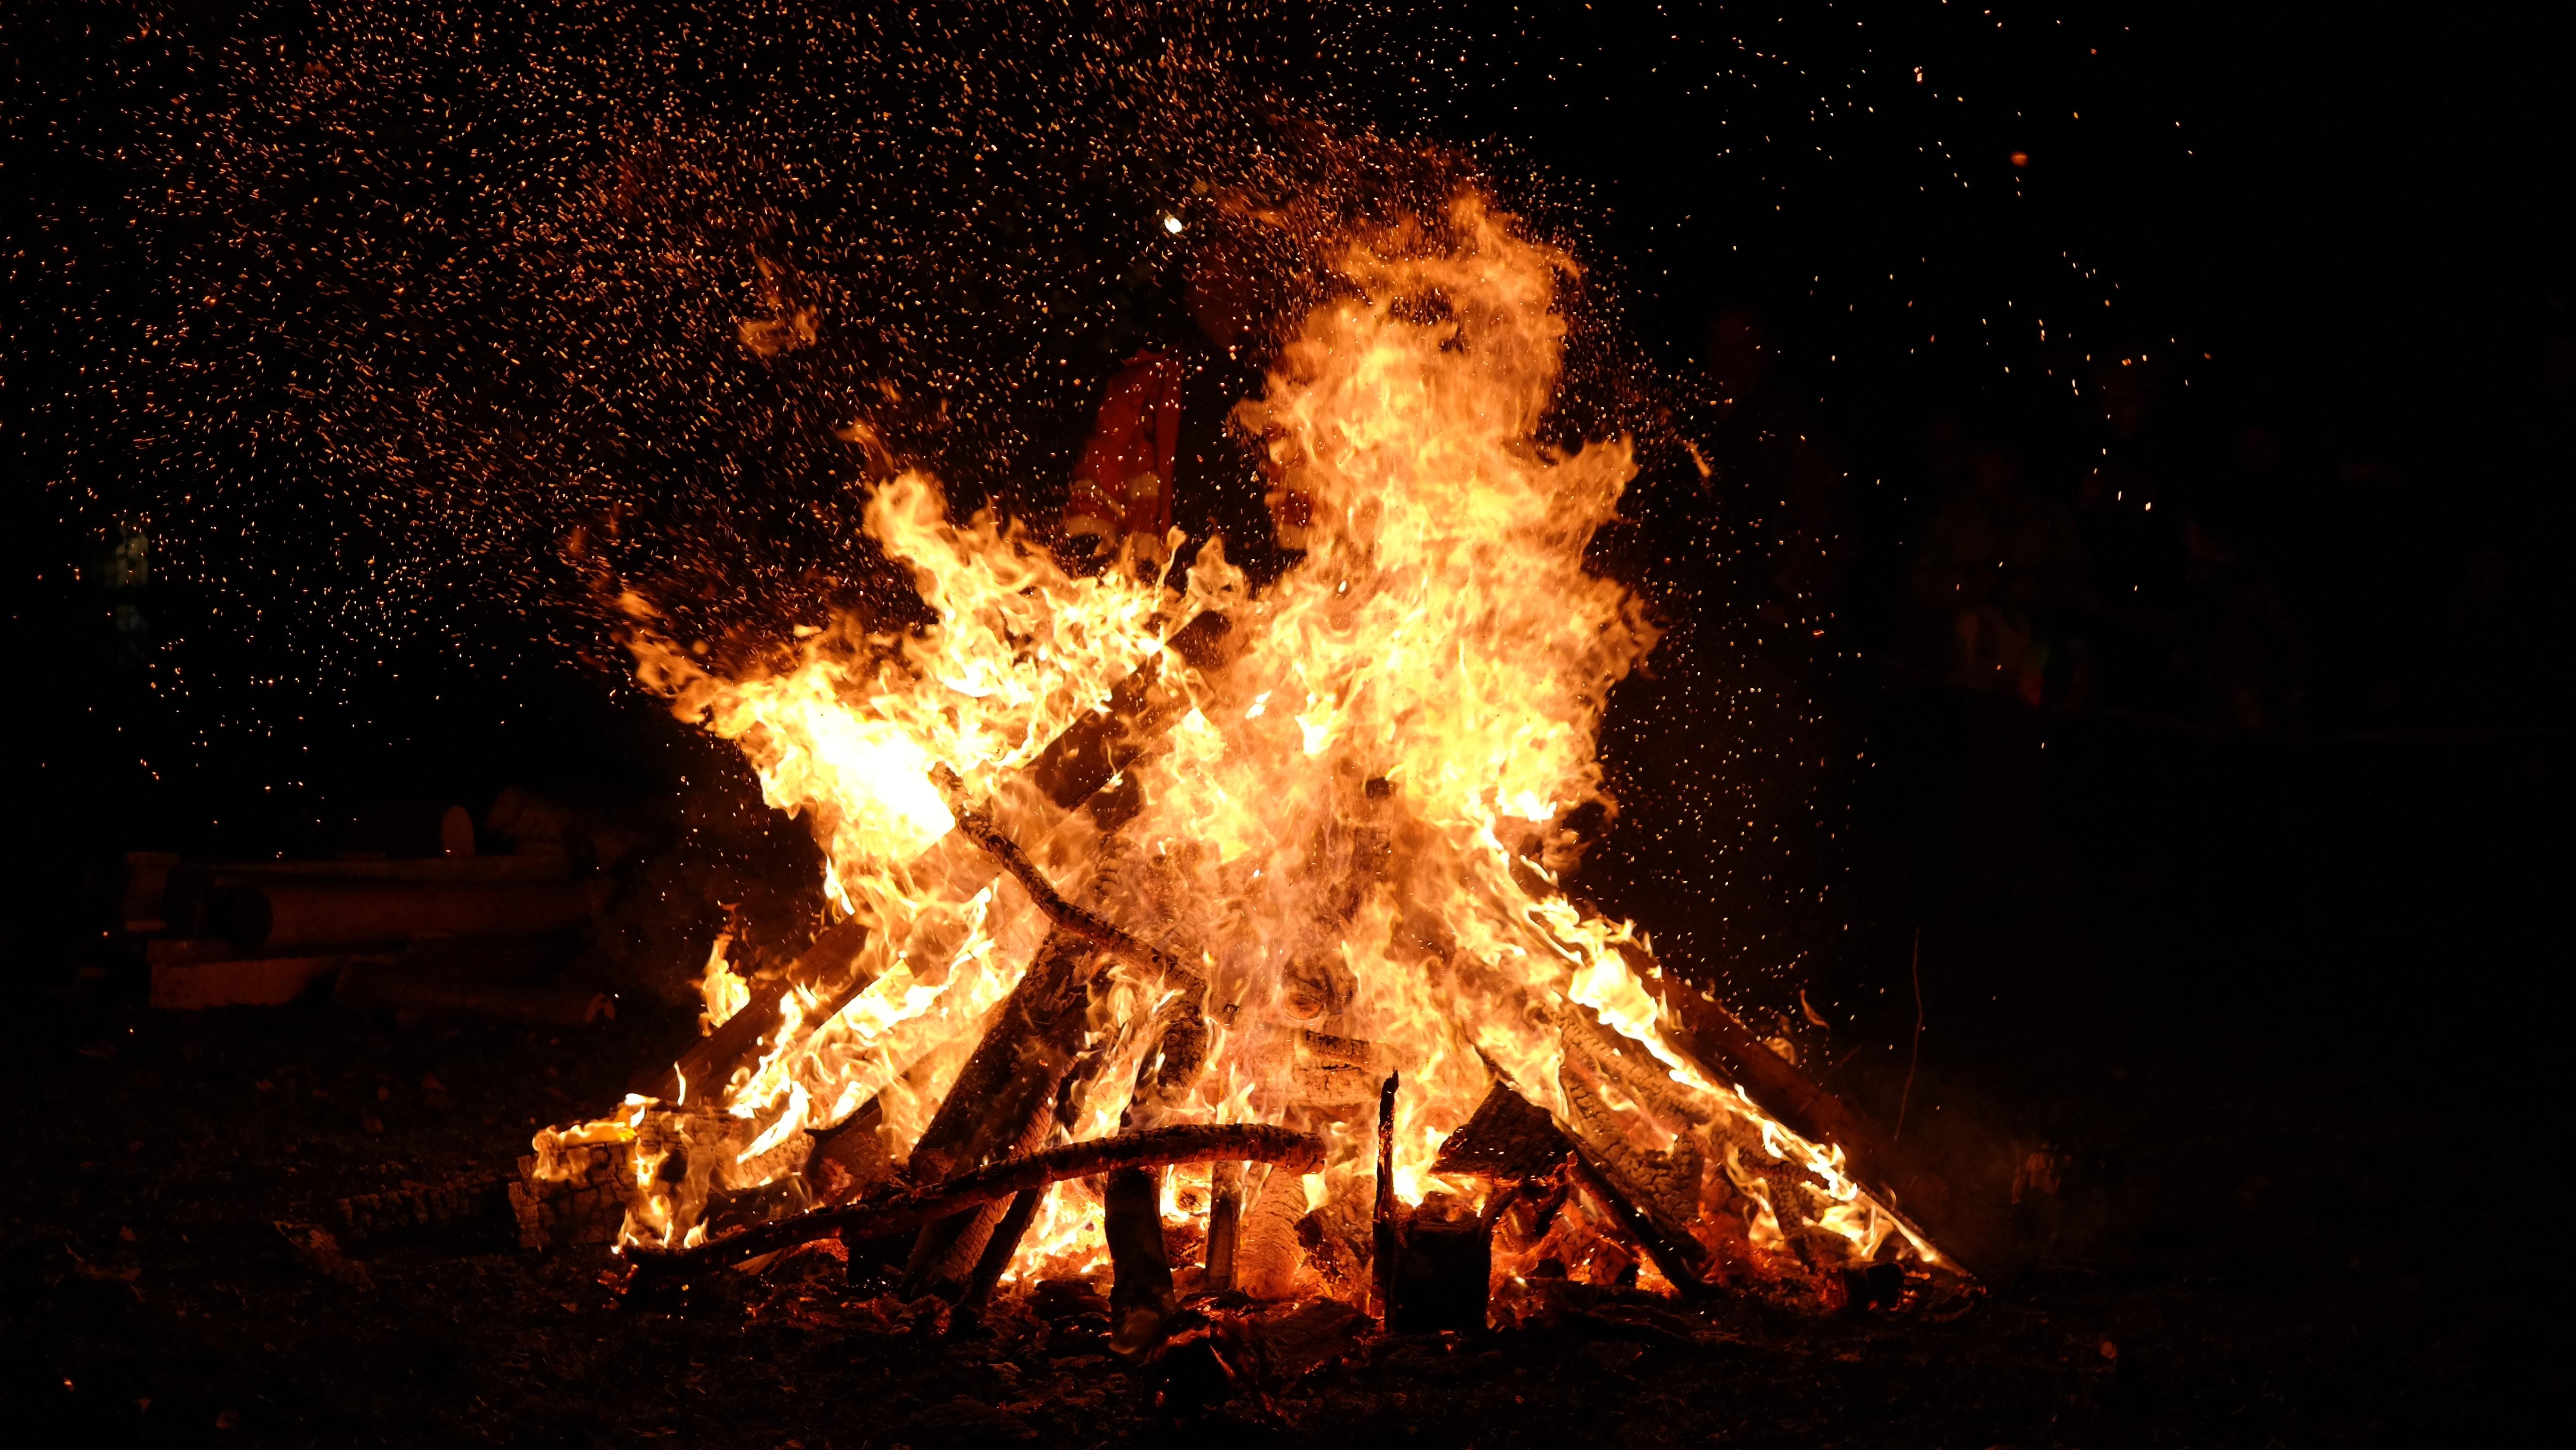 Bonfire Photo, Flame, Firewood, Heat, Night, HQ Photo